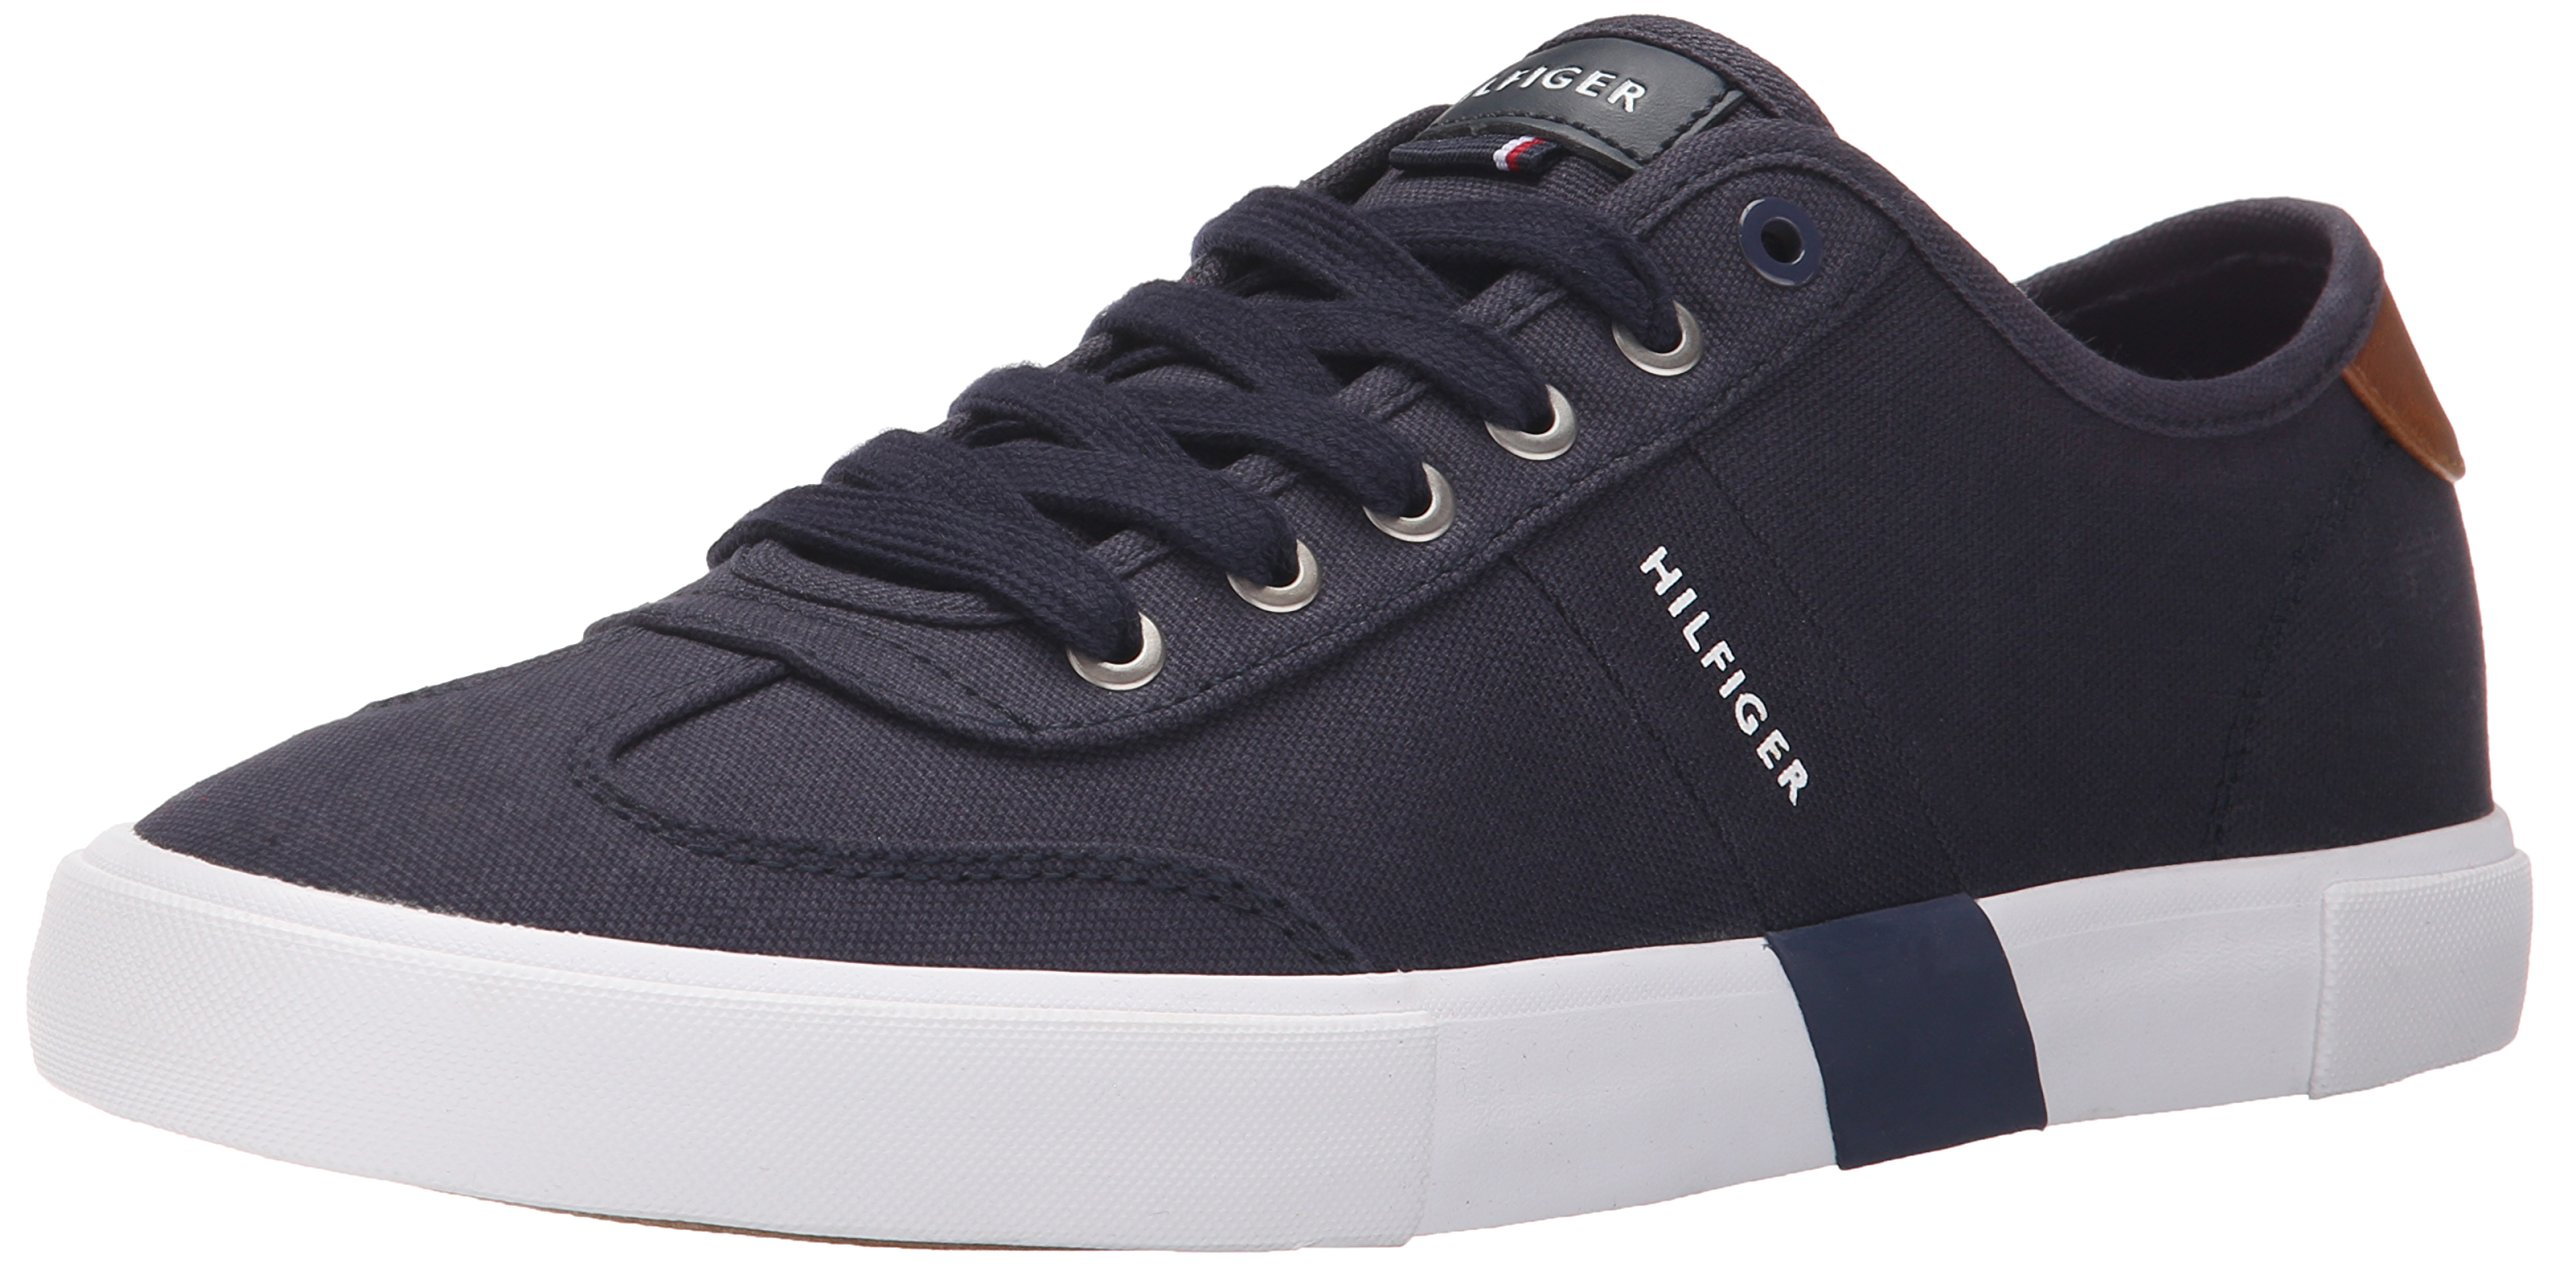 Tommy Hilfiger Men S Pandora Shoe Navy 8 Medium Us